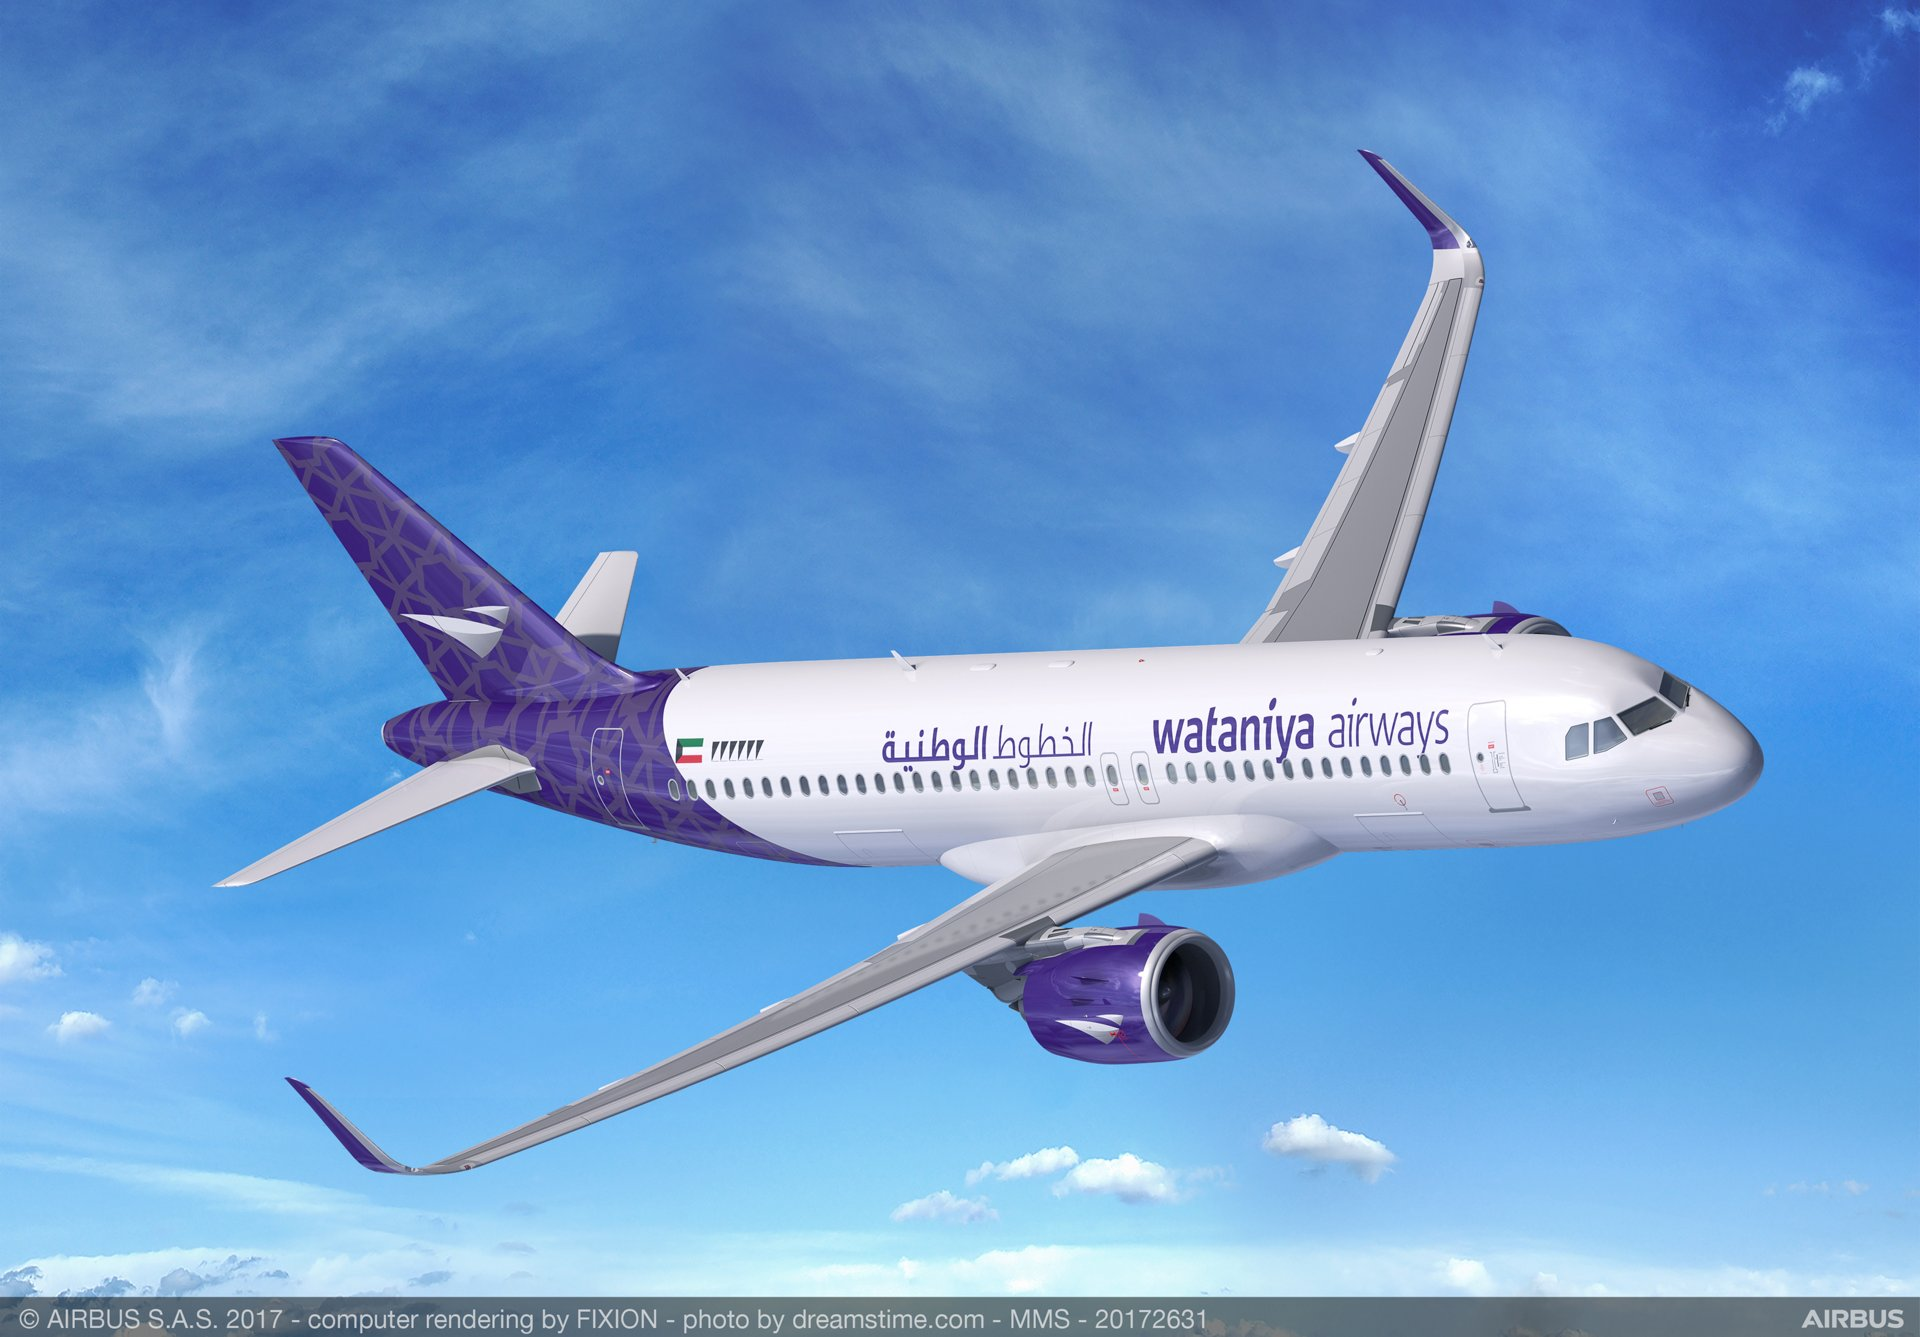 Wataniya Airways to add 25 A320neo Family aircraft